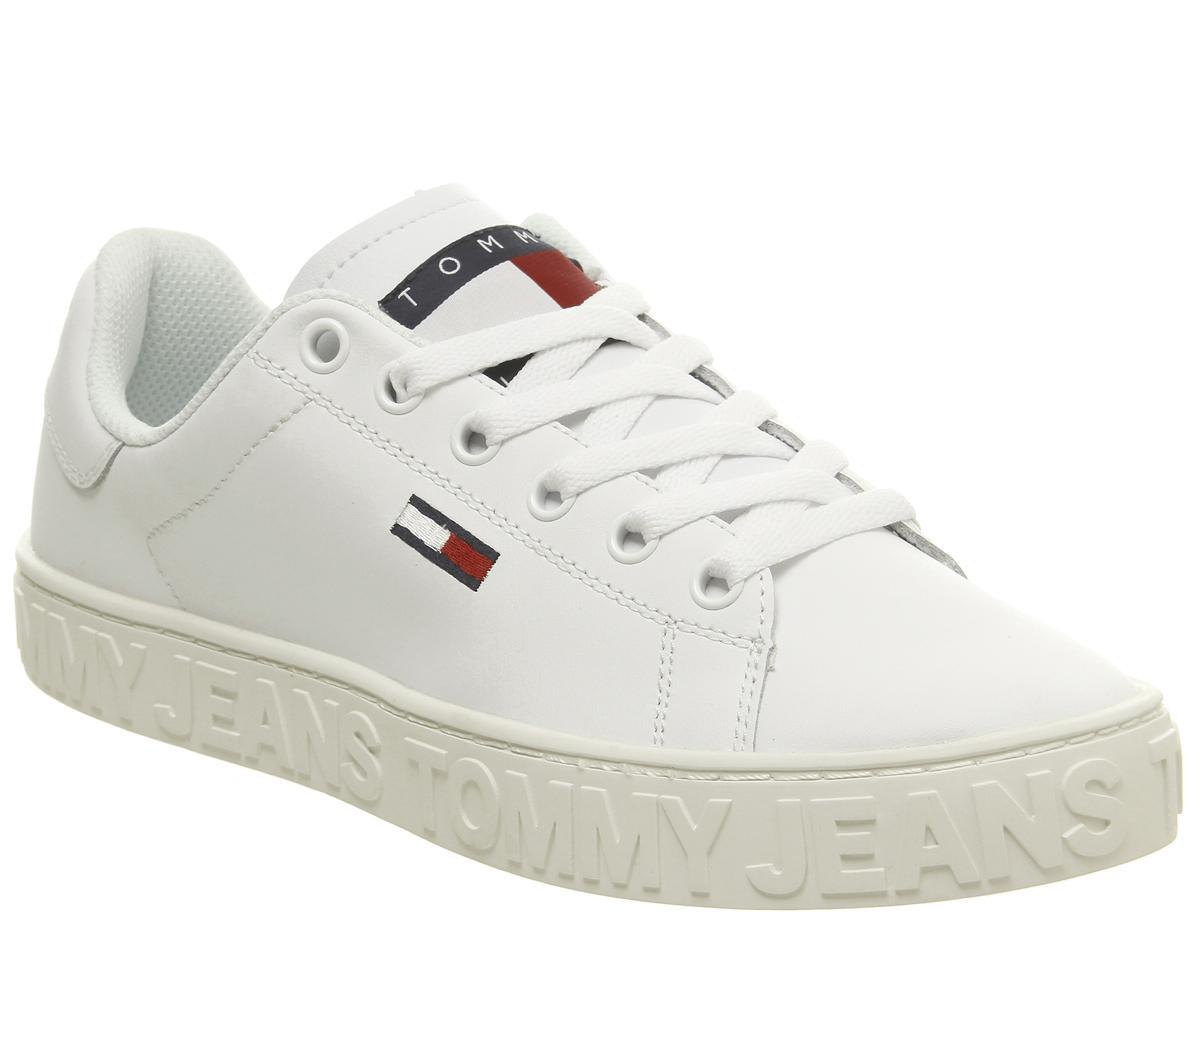 Tommy Hilfiger Girls White Slip-On Trainers.